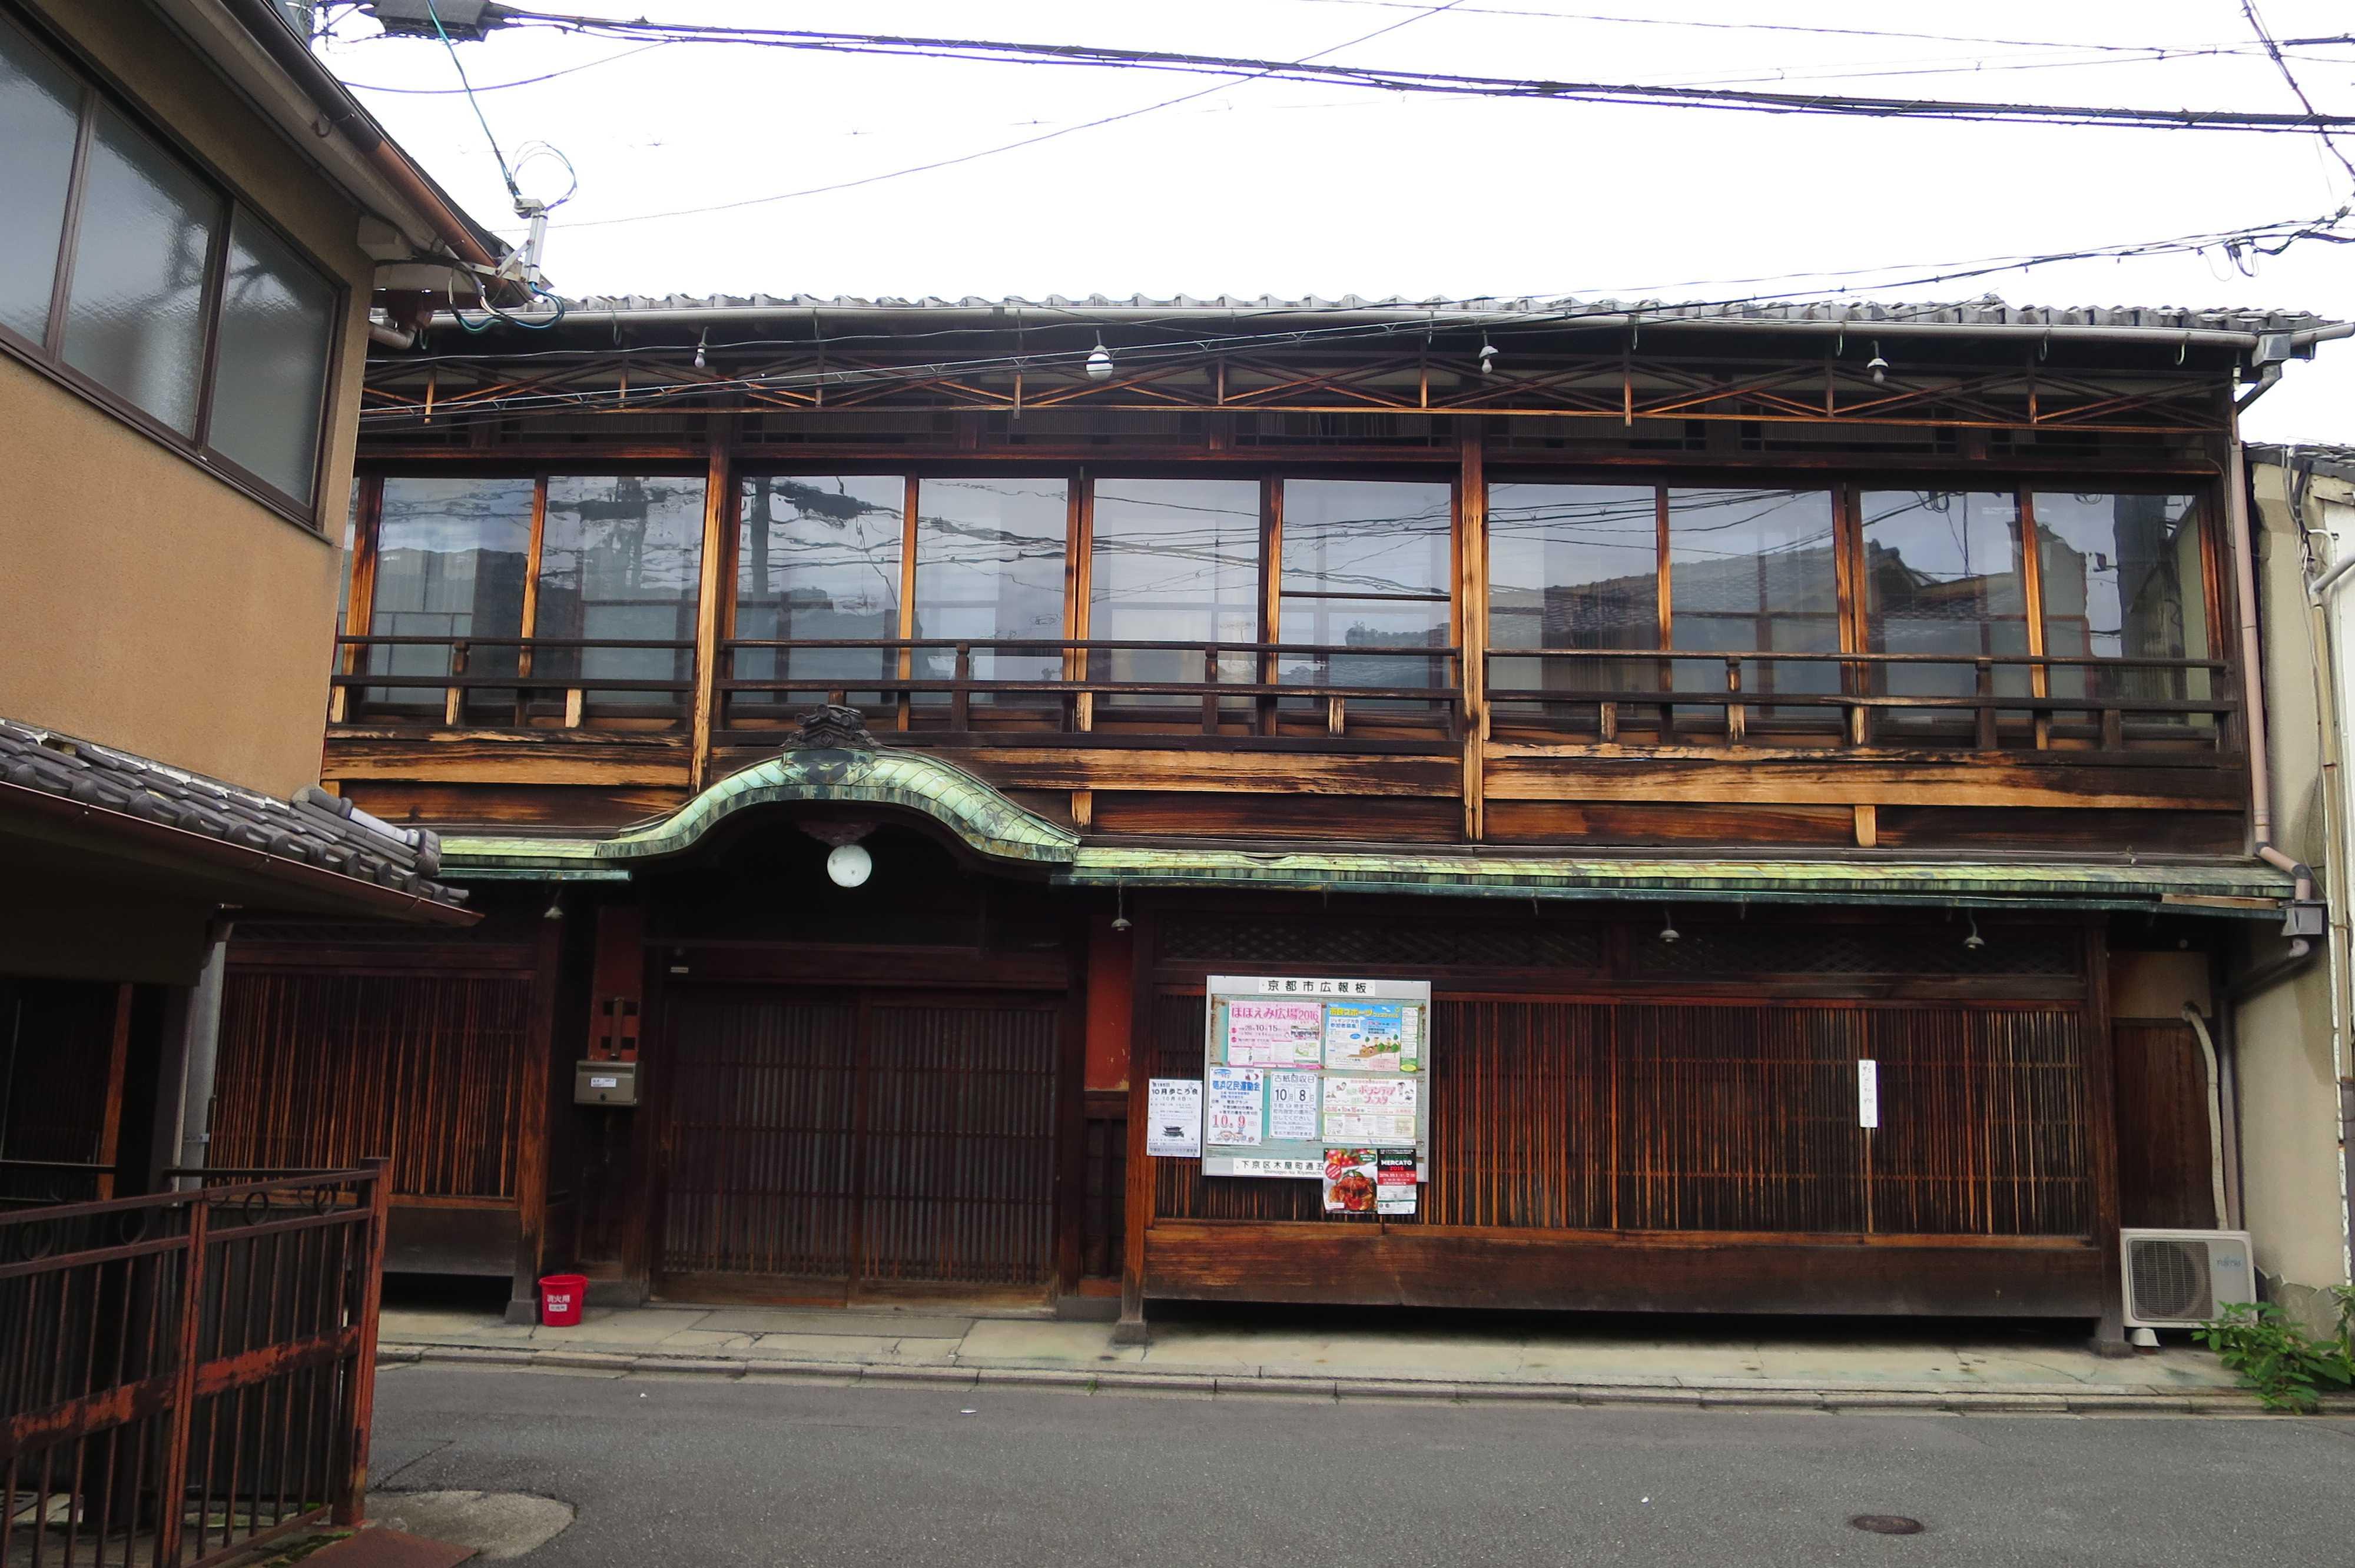 京都・五条 - 元遊郭の偉容(異様)